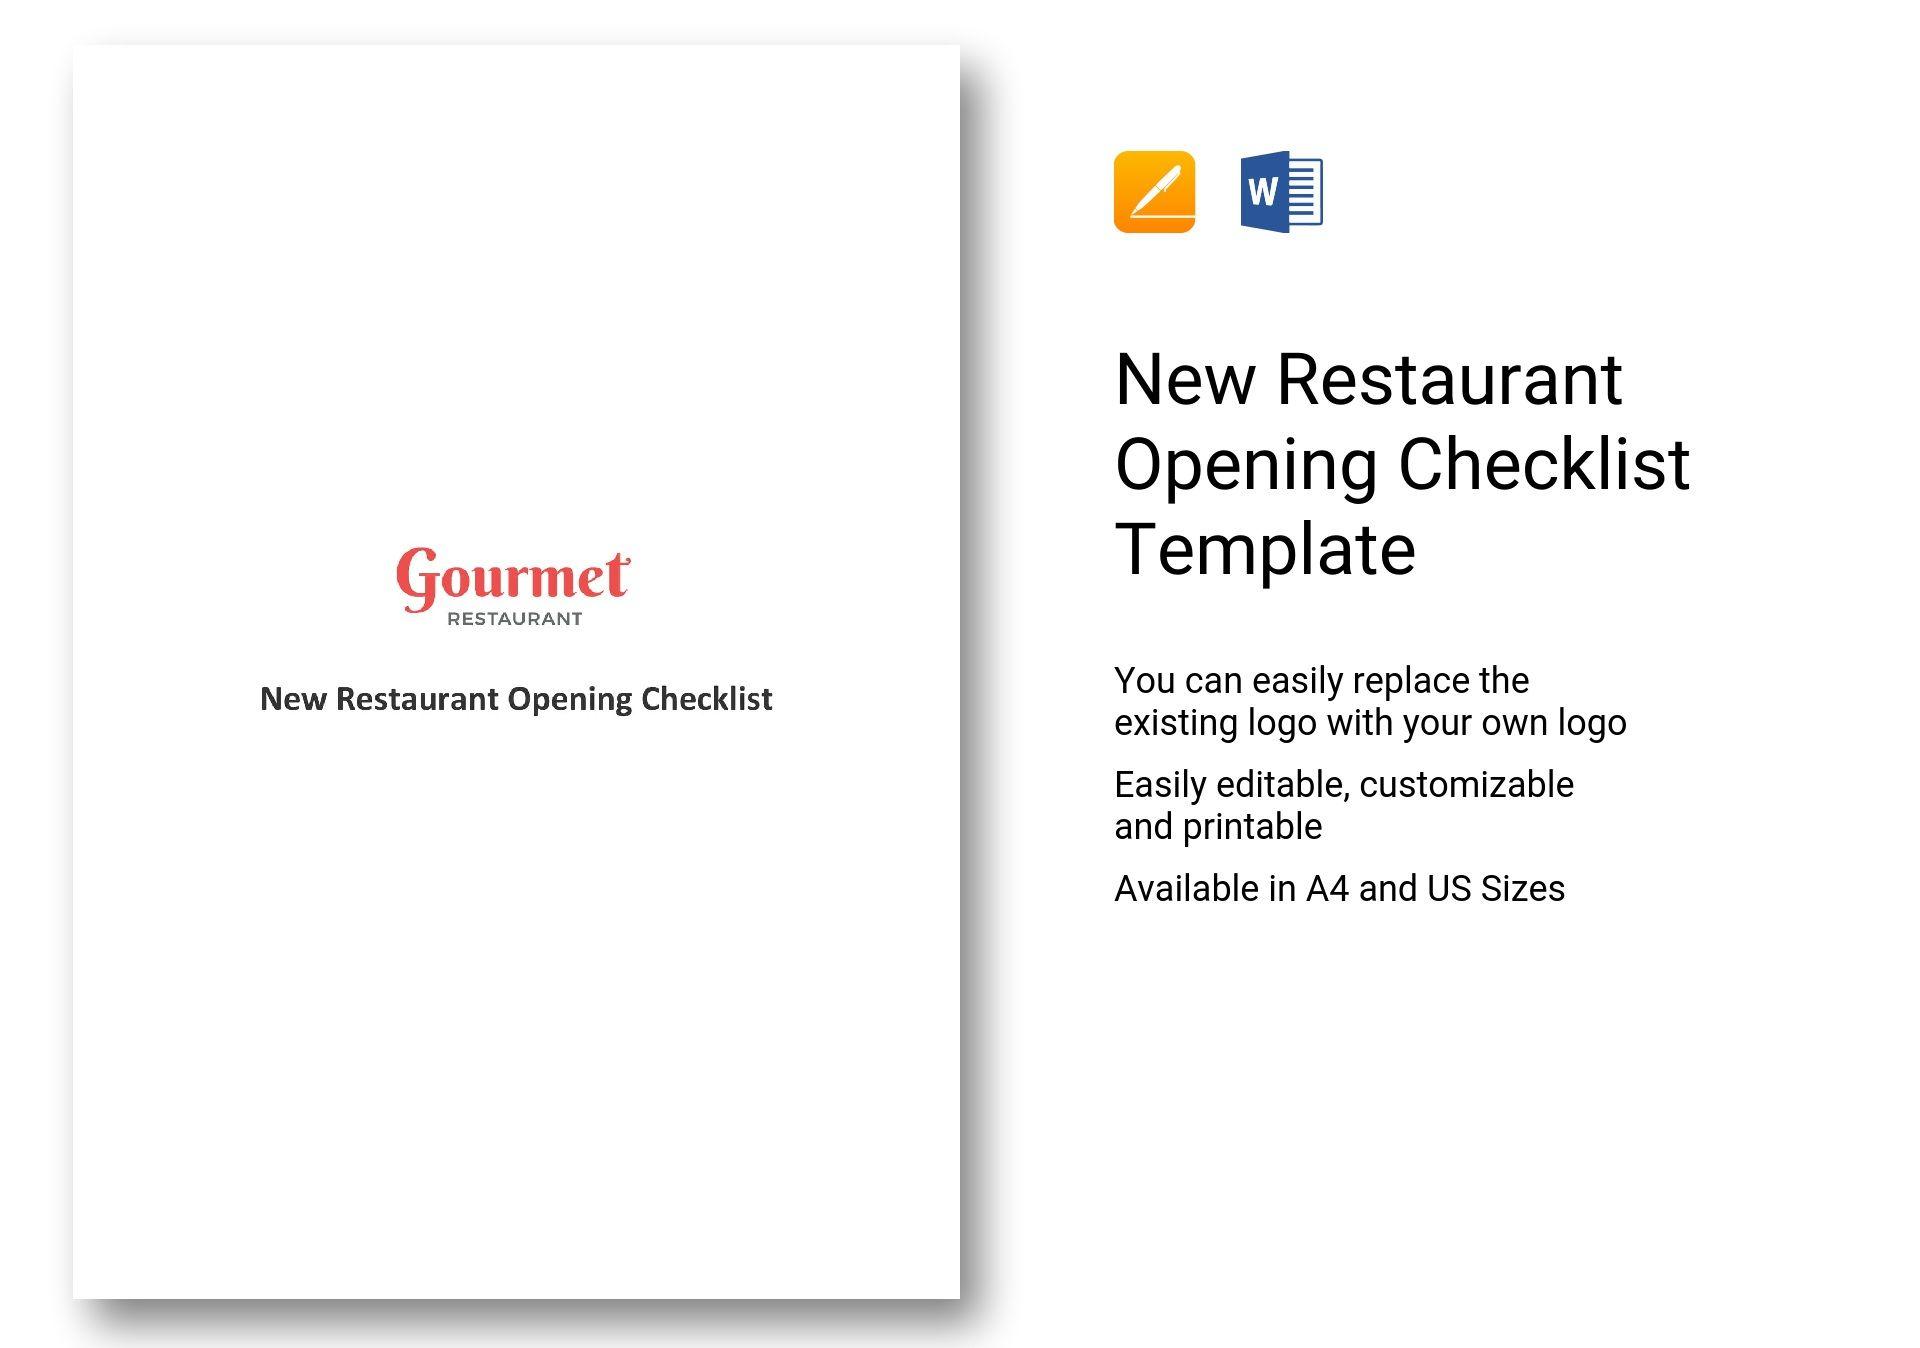 restaurant opening checklist - Emayti australianuniversities co